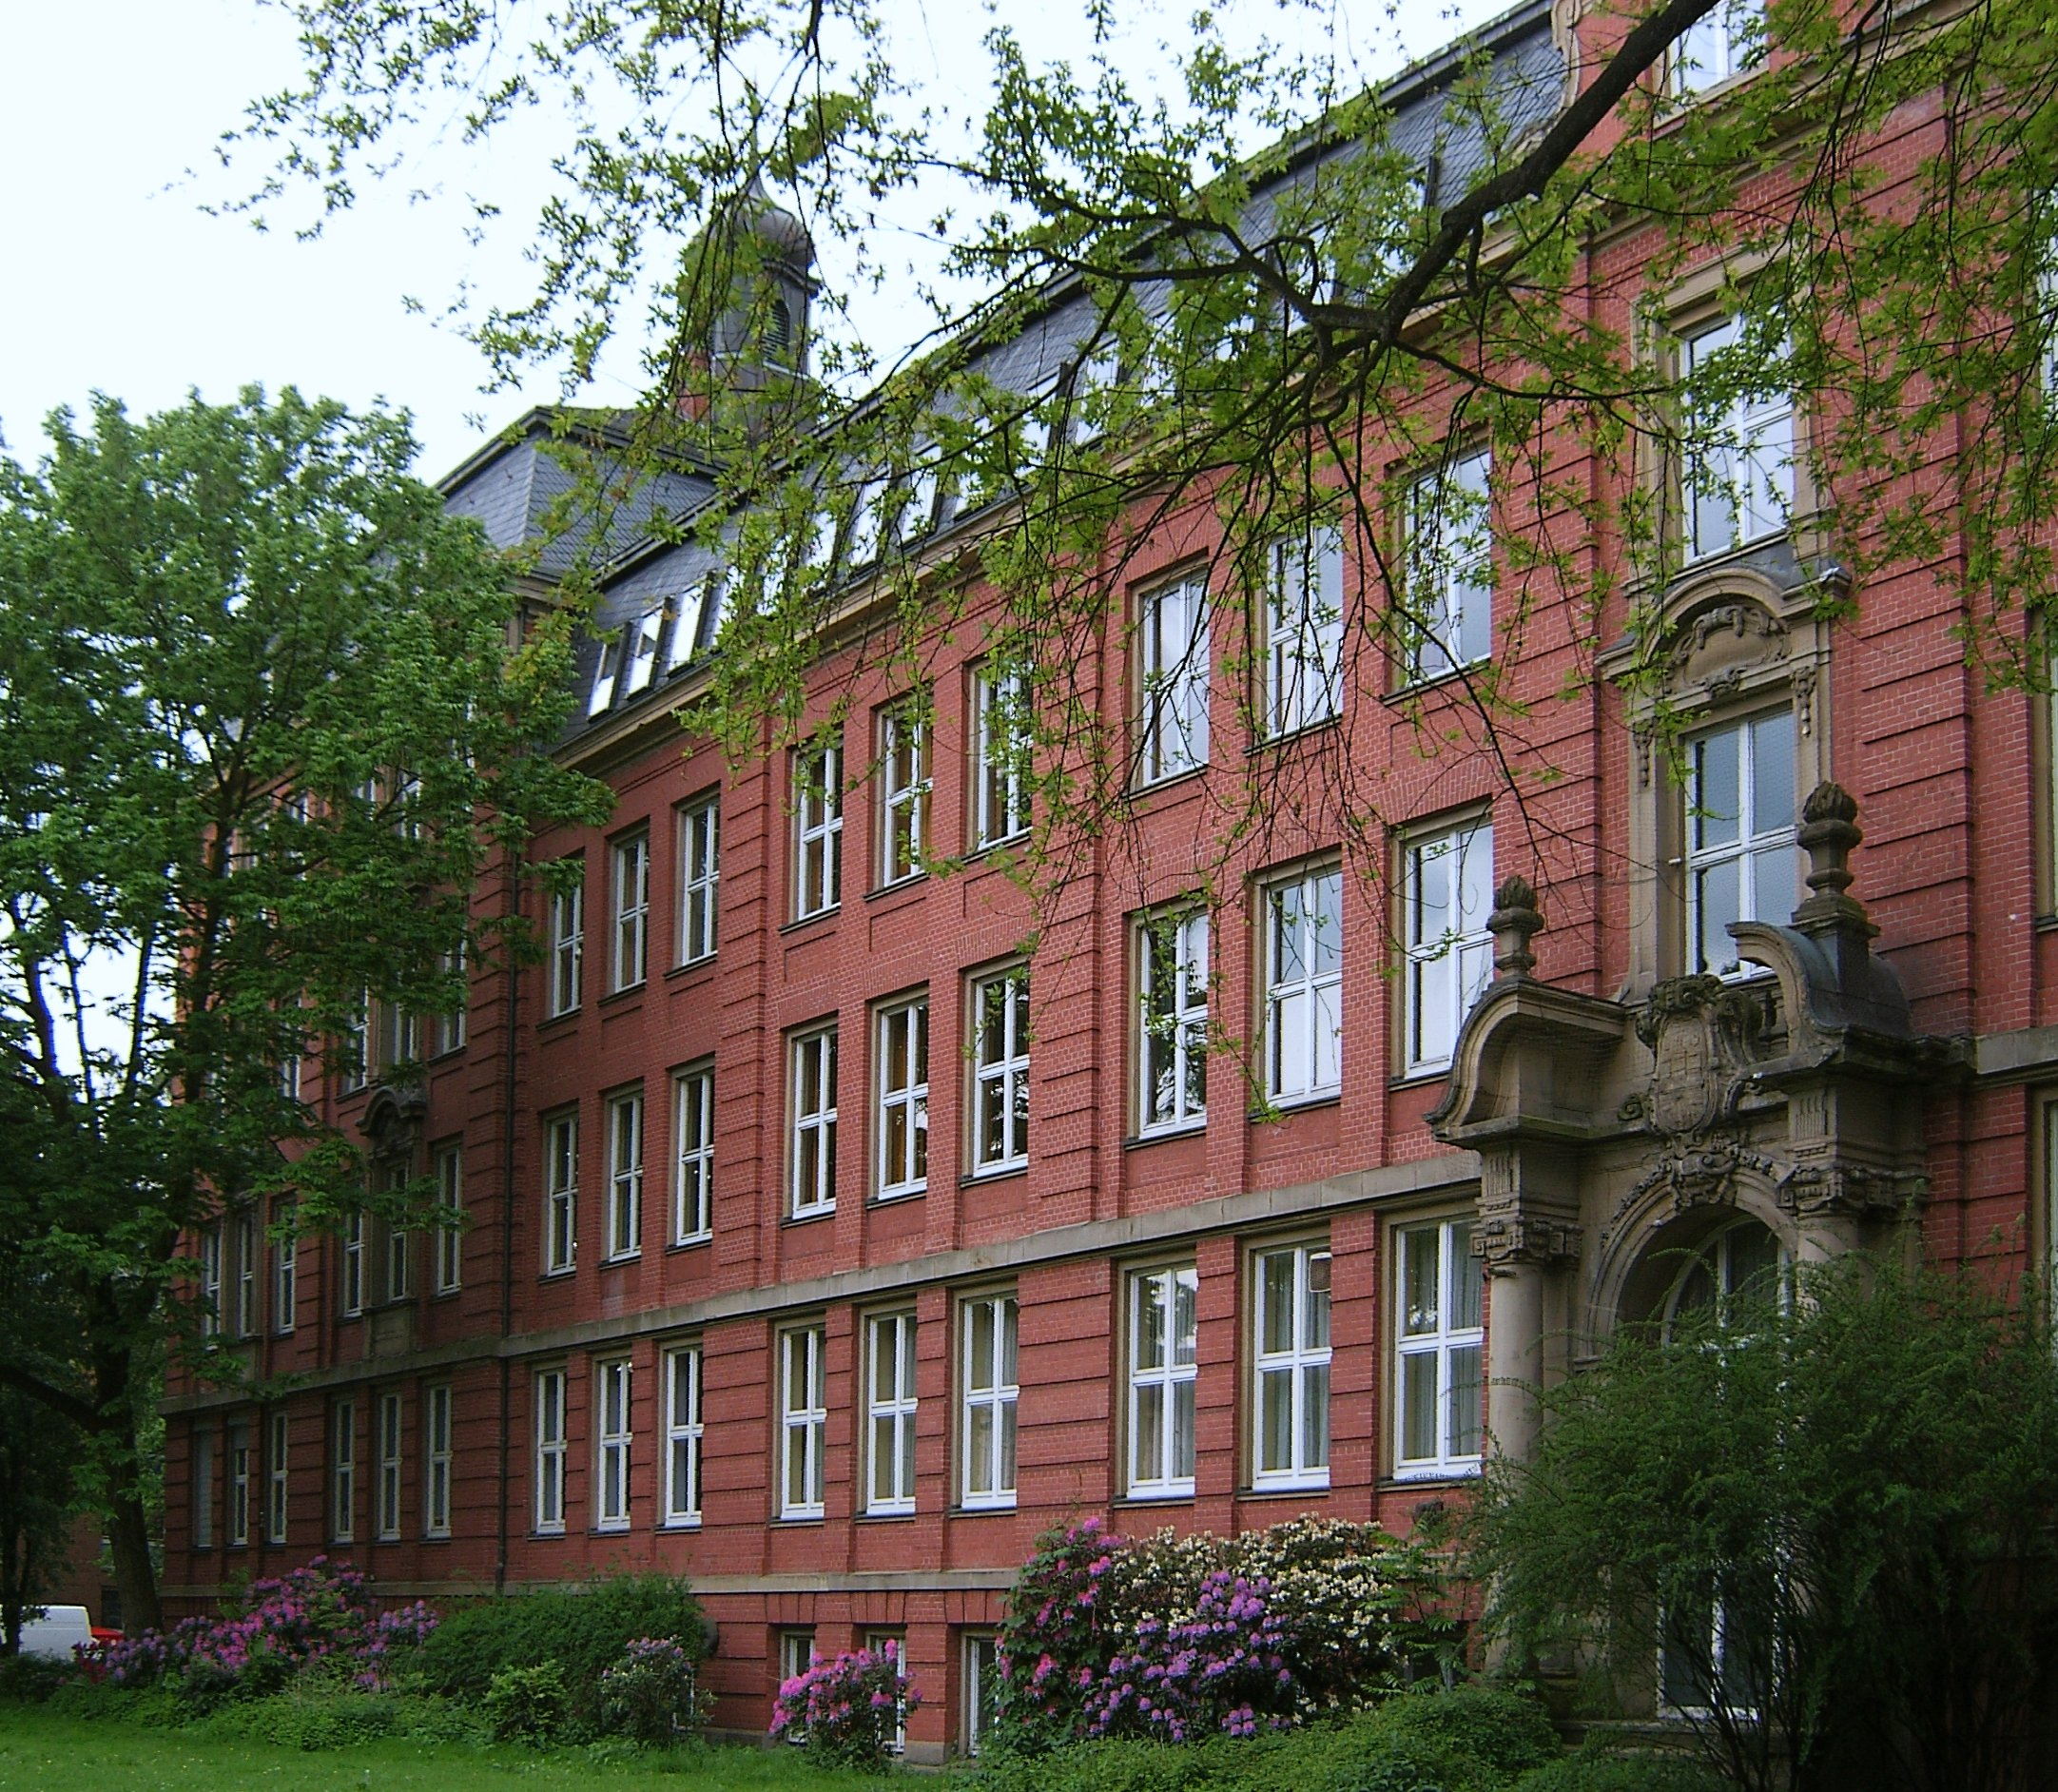 Eilbeker Krankenhaus